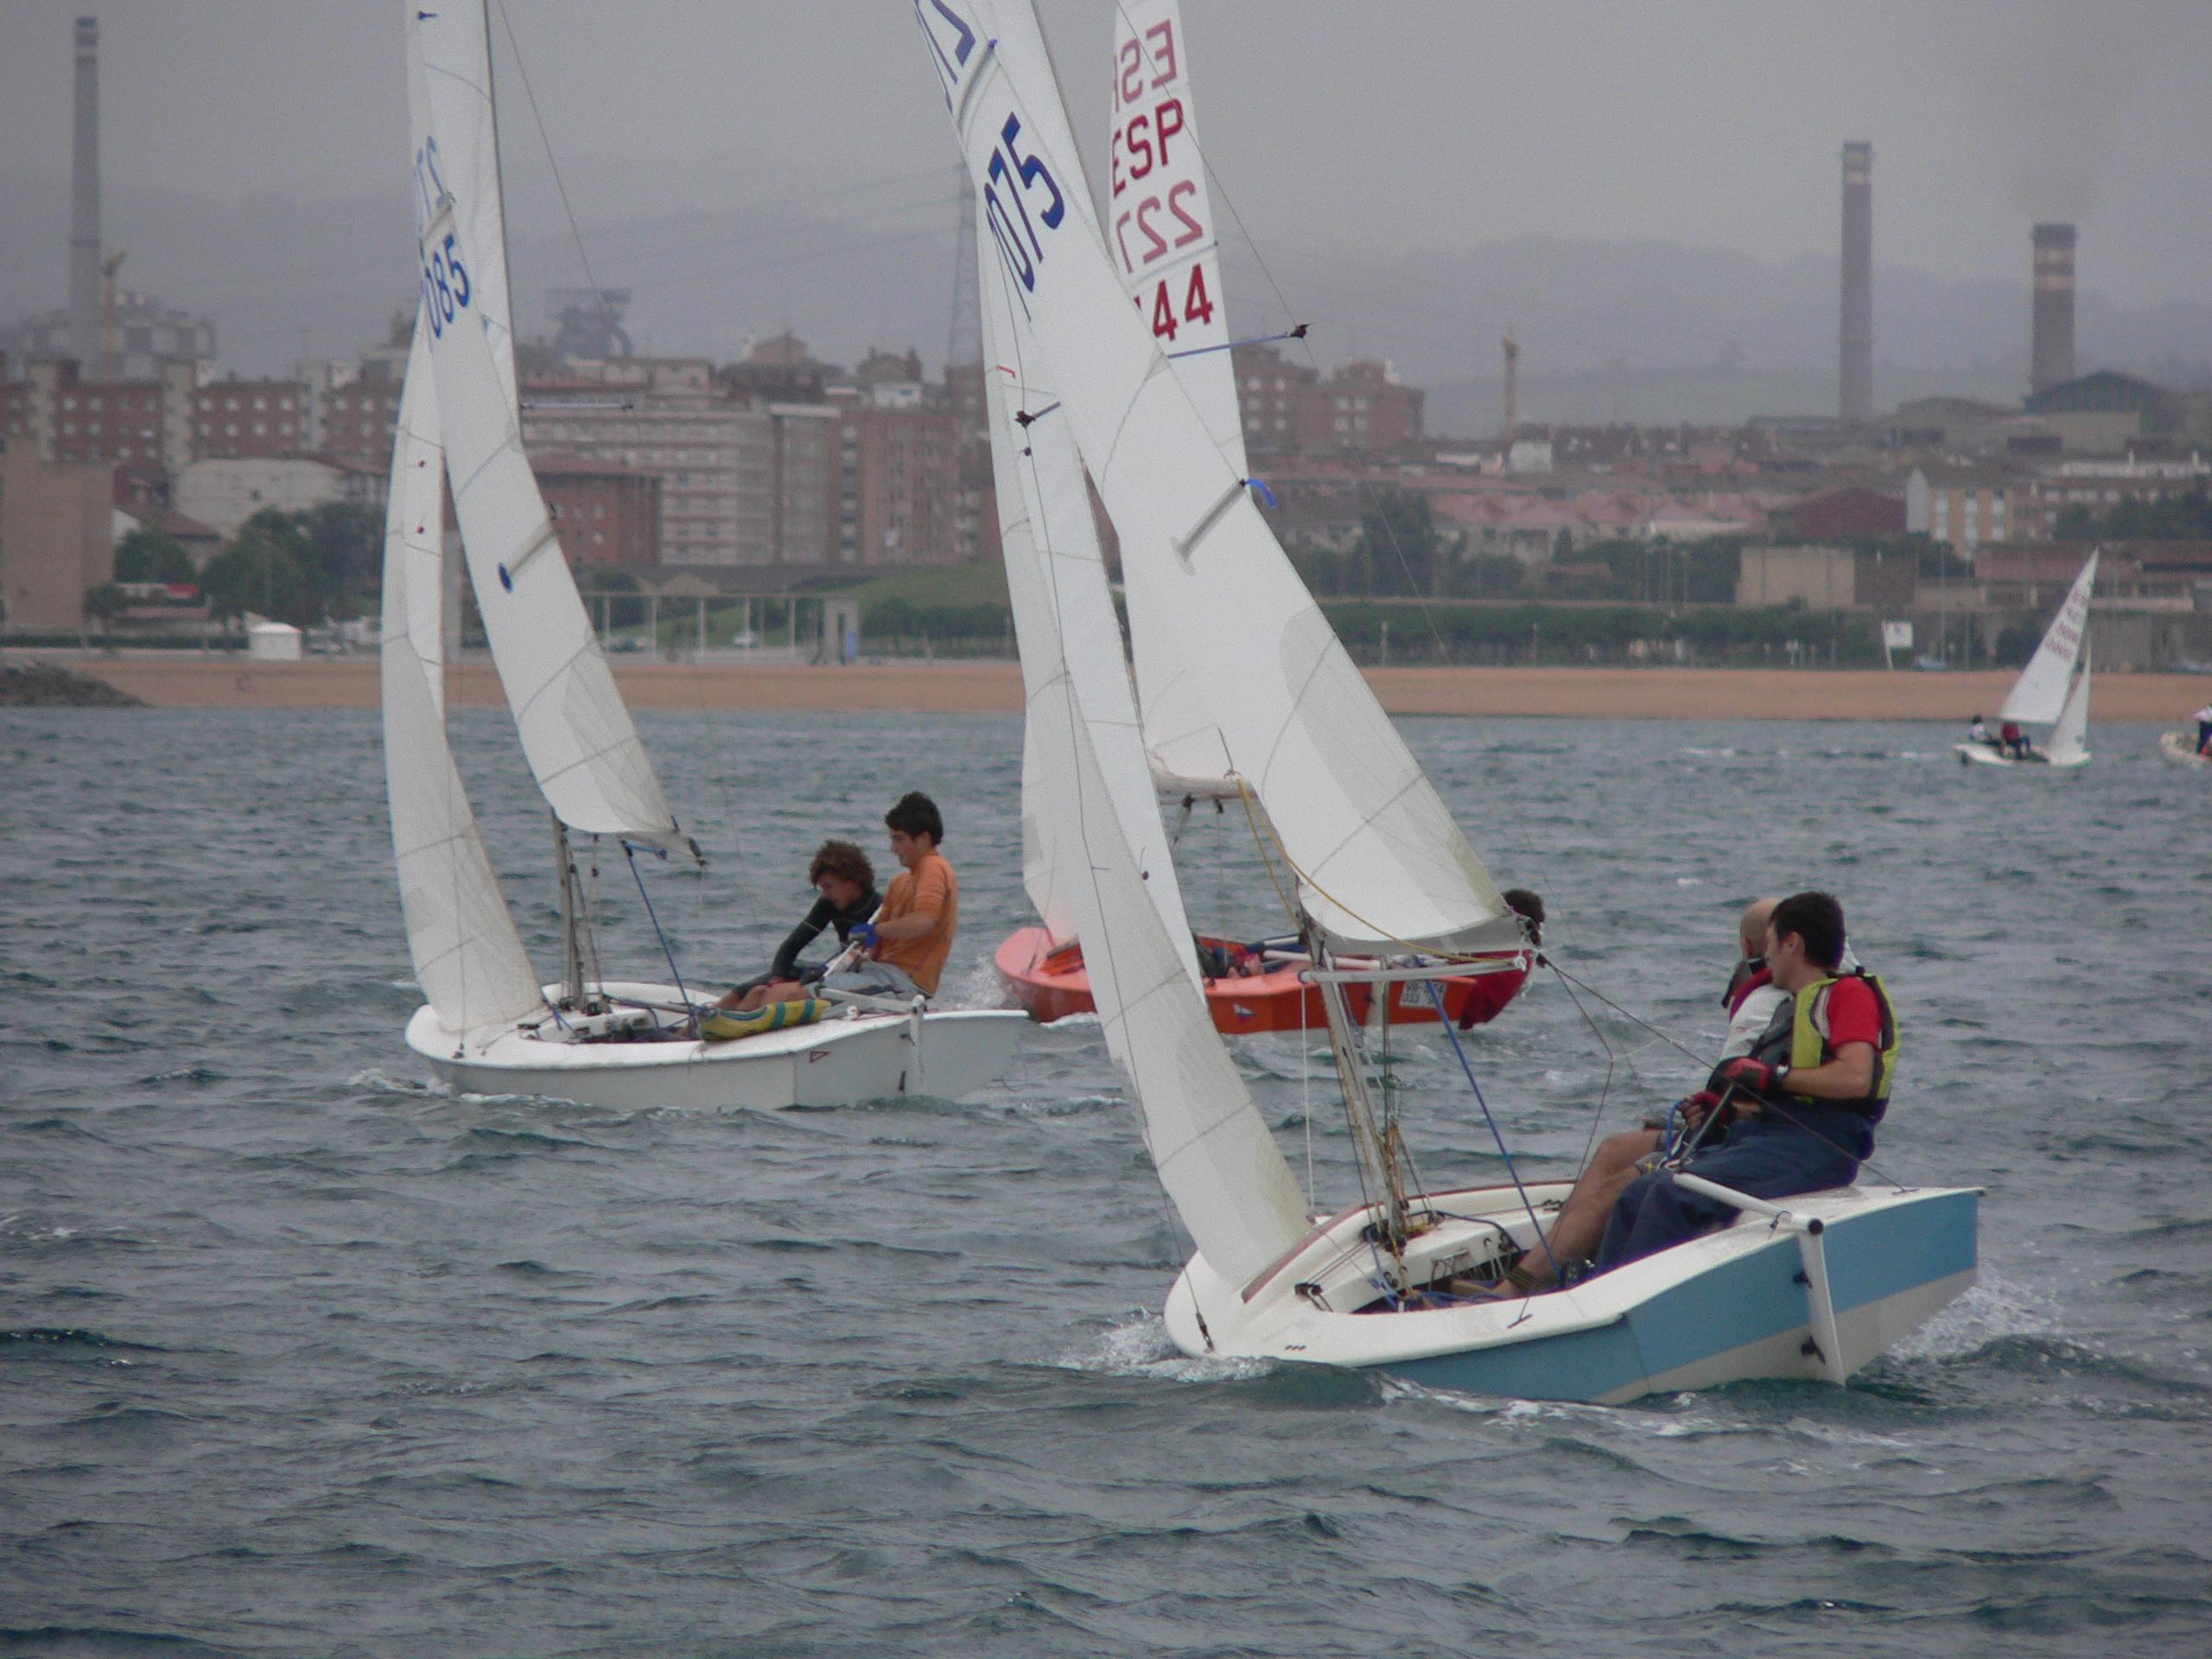 Snipe sailing dinghy plans